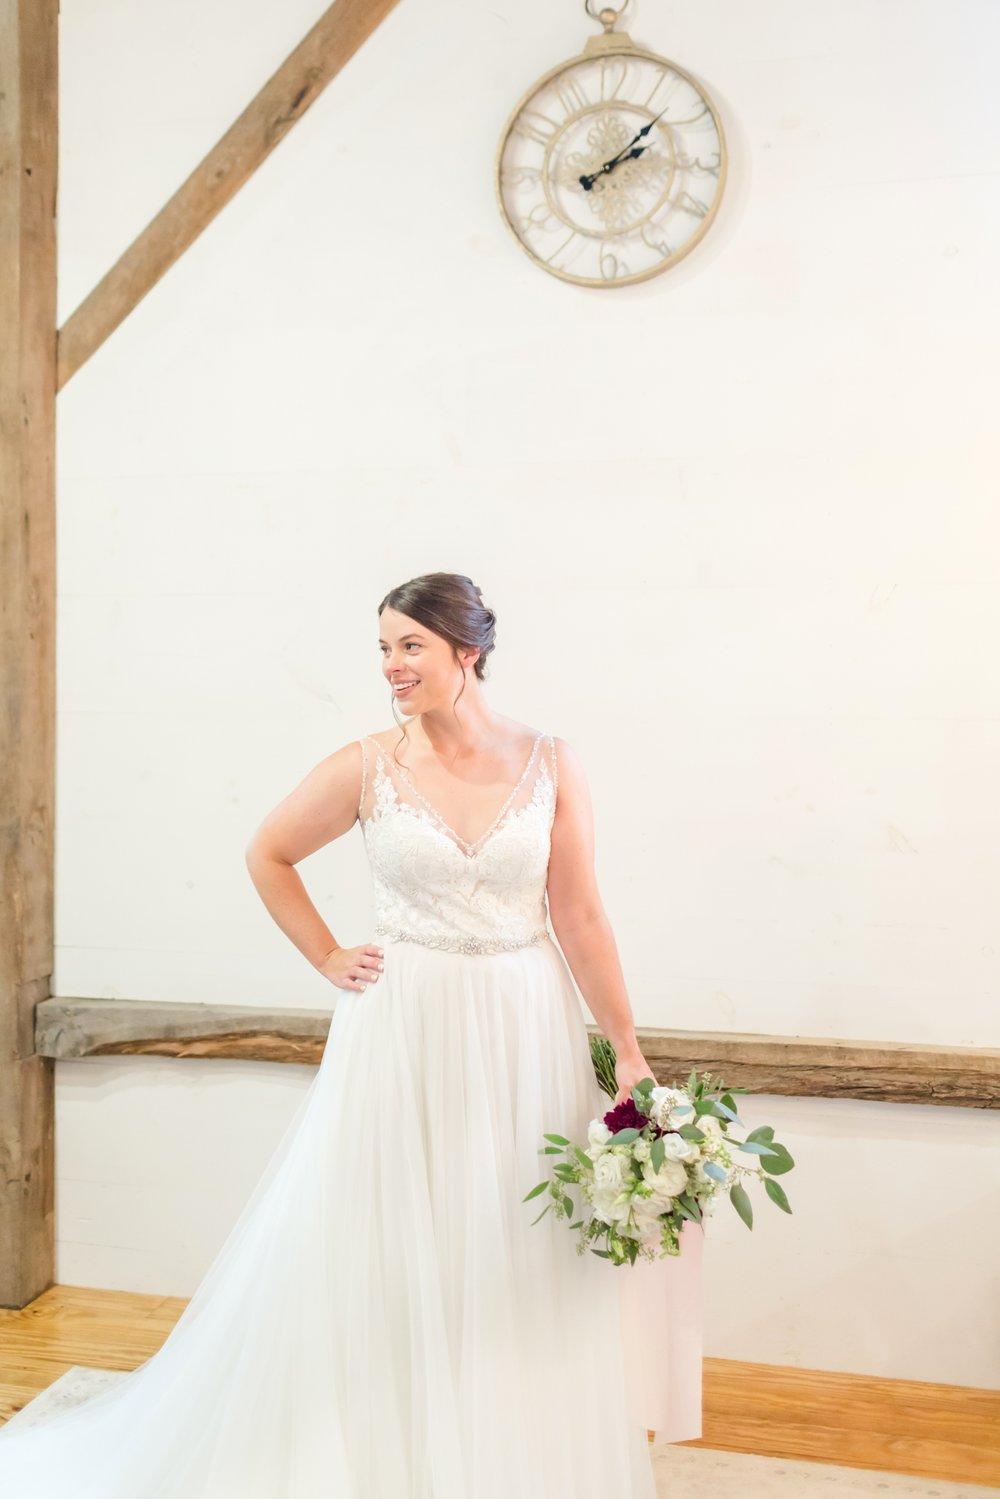 ADKINS WEDDING HIGHLIGHTS-77_The-Granary-wedding-Valley-Pike-Farm-Market-Virginia-wedding-photographer-anna-grace-photography-photo.jpg